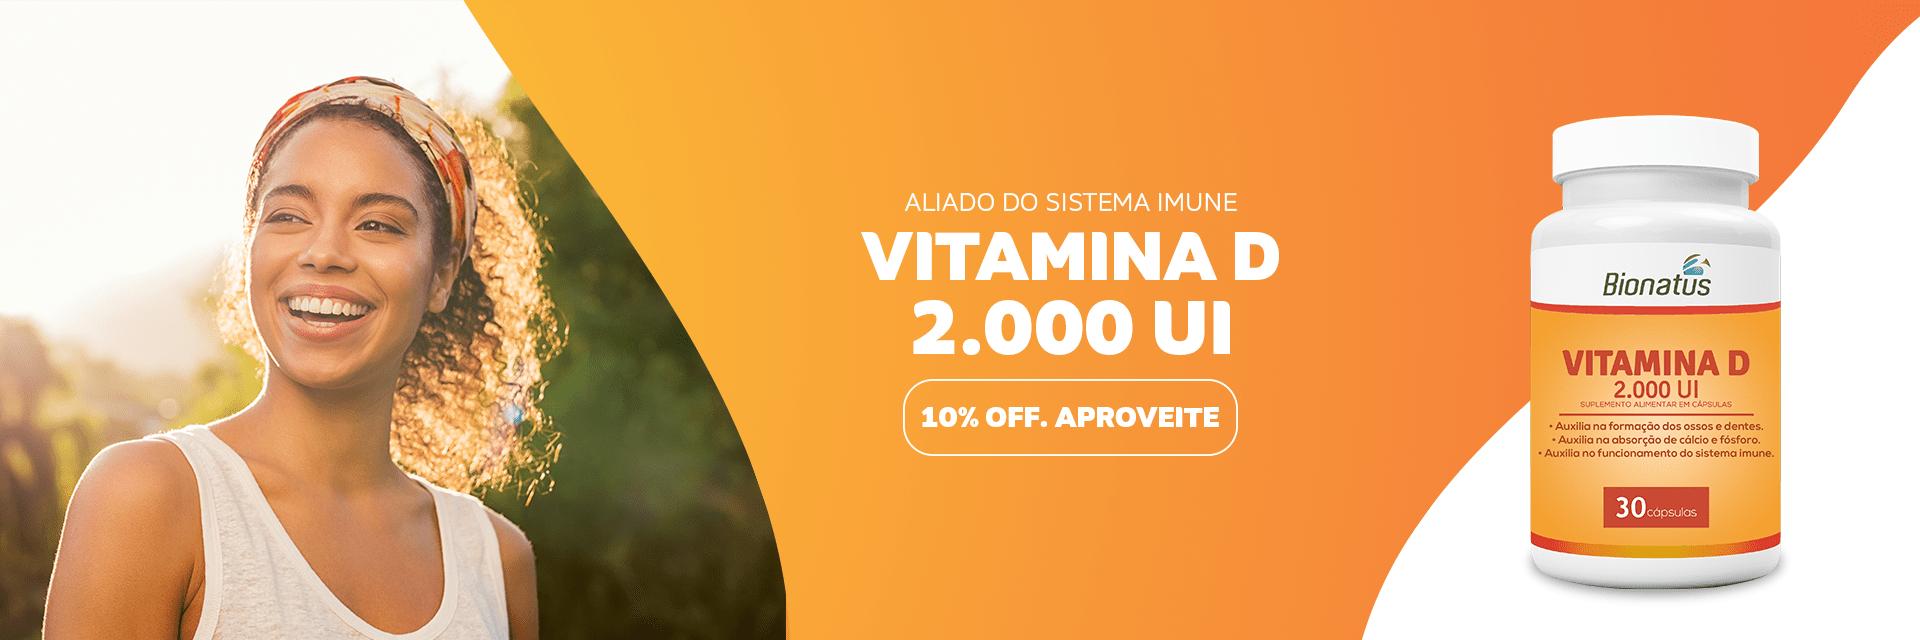 Vitamina D 10%